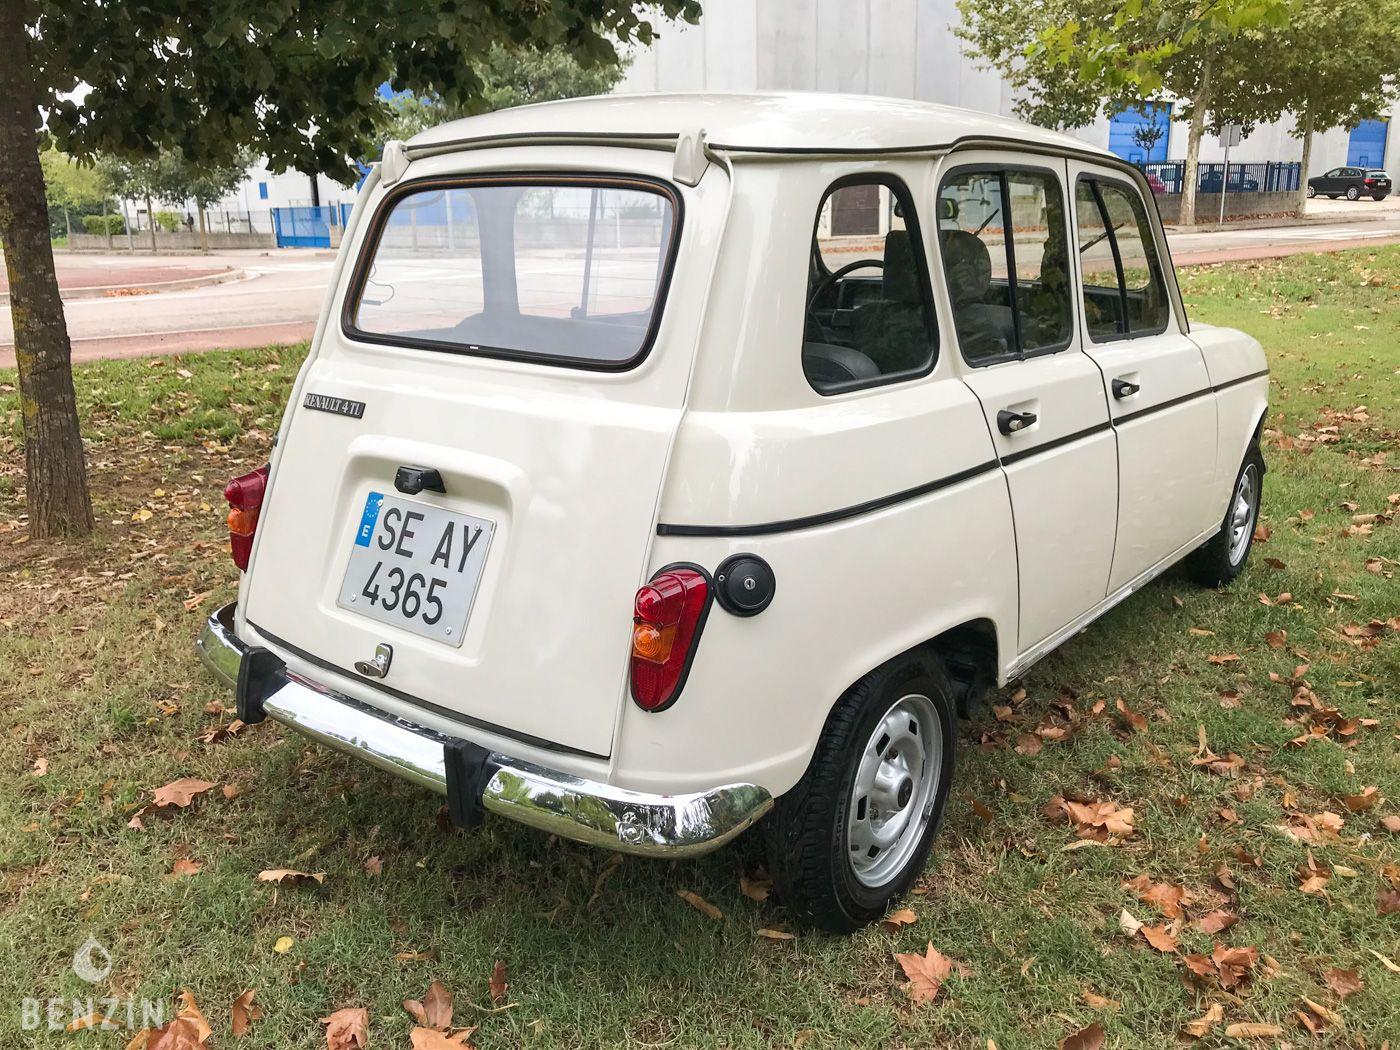 Renault 4 TL a vendre/ Renault 4 TL to sell/ Renault 4 TL verkaufen/ Renault 4 TL en venta